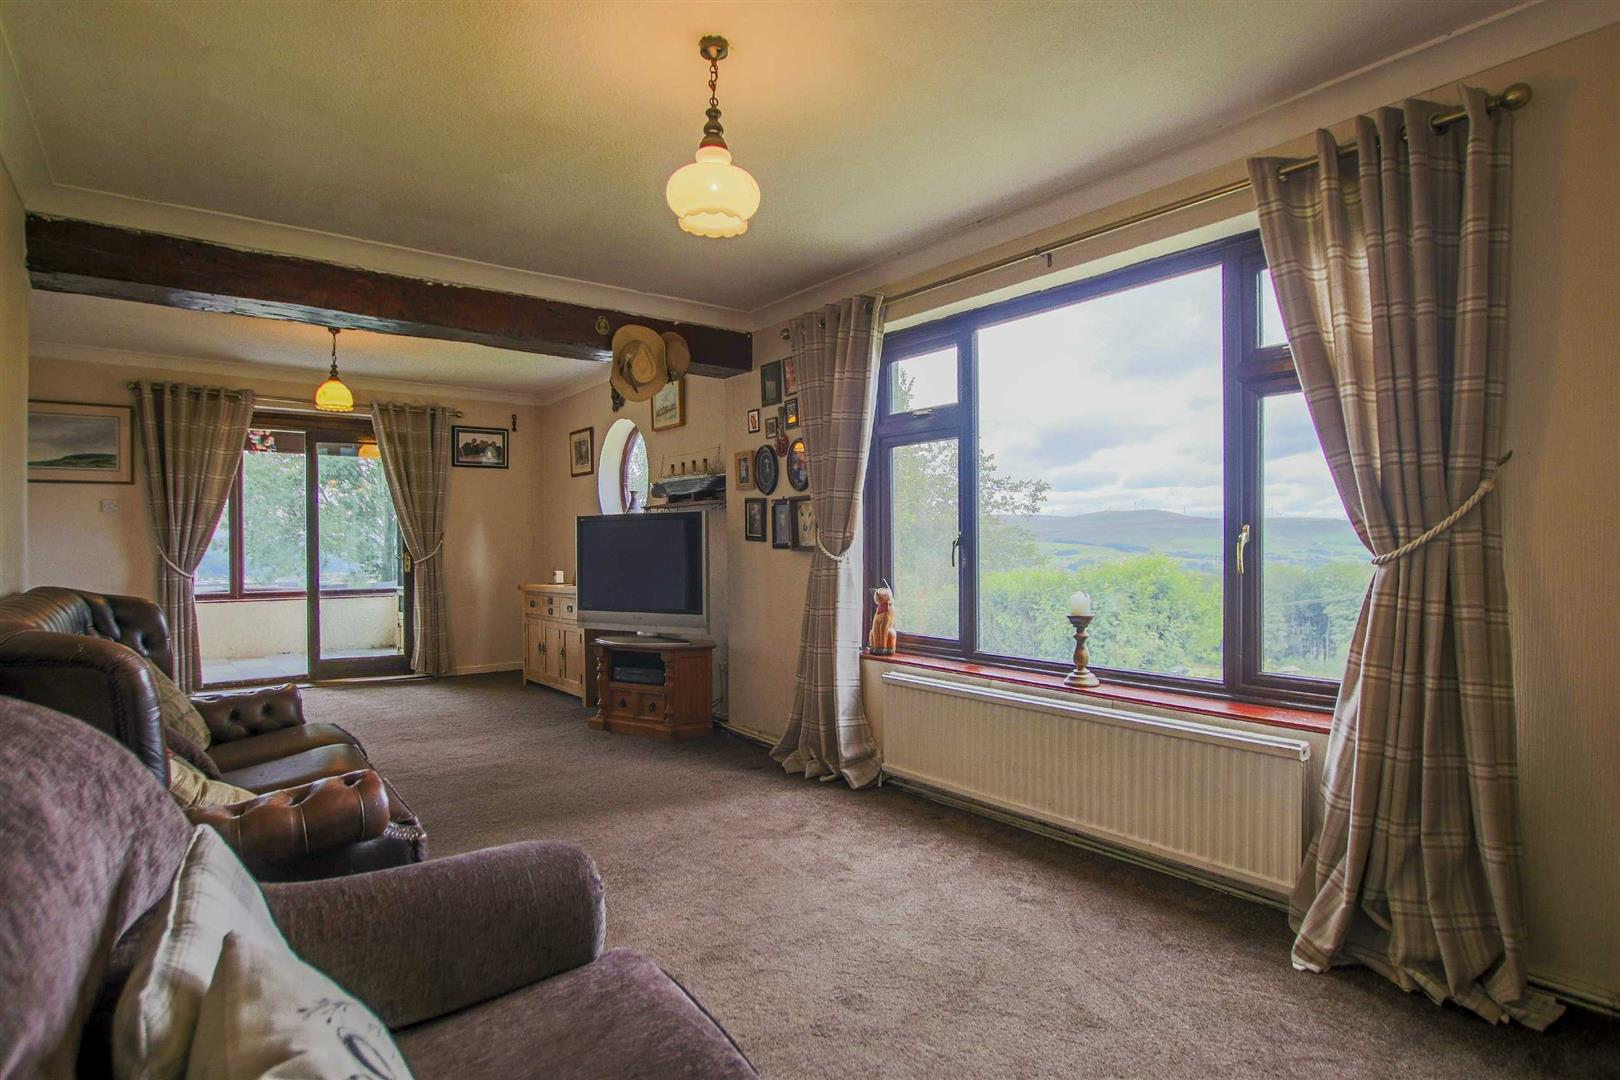 4 Bedroom Semi-detached House For Sale - Image 10